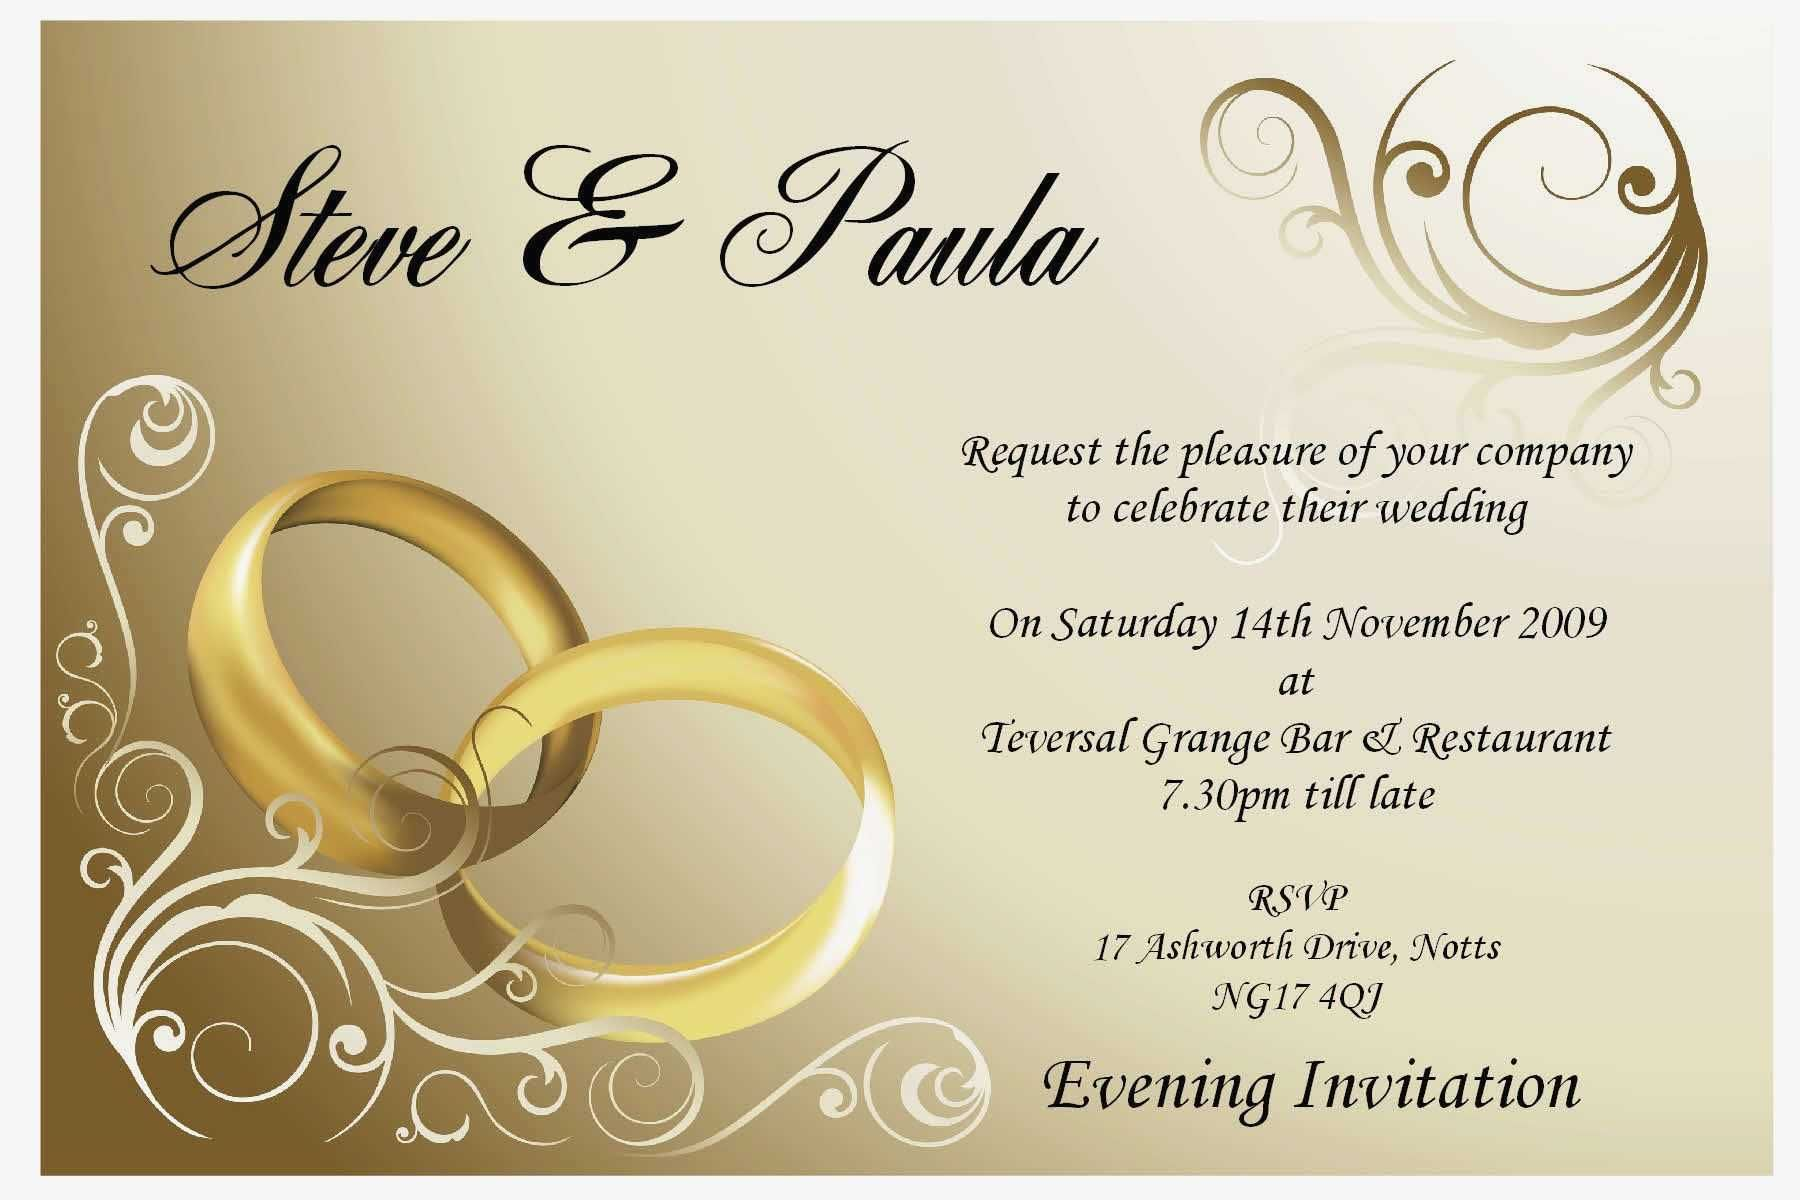 24 Wedding Invitations Online Cafecanon Info Engagement Invitation Cards Personalised Wedding Invitations Wedding Invitation Layout